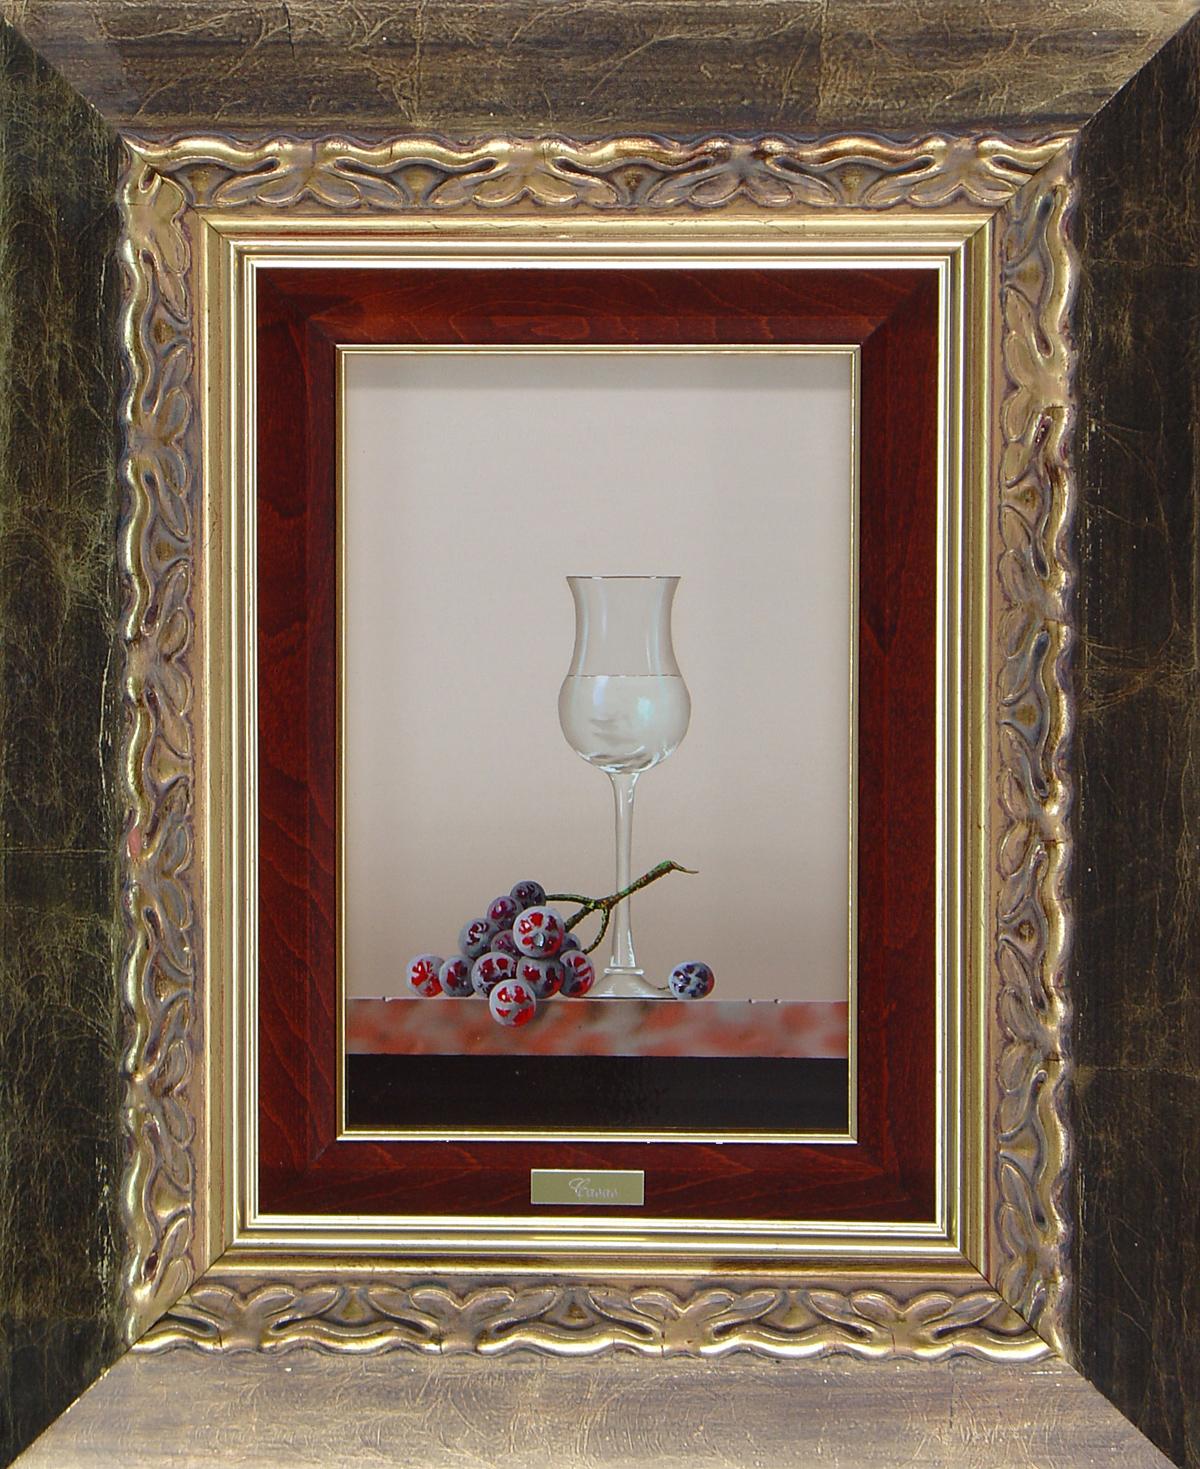 Casas, Original oil painting on panel, Still Life. Click to enlarge